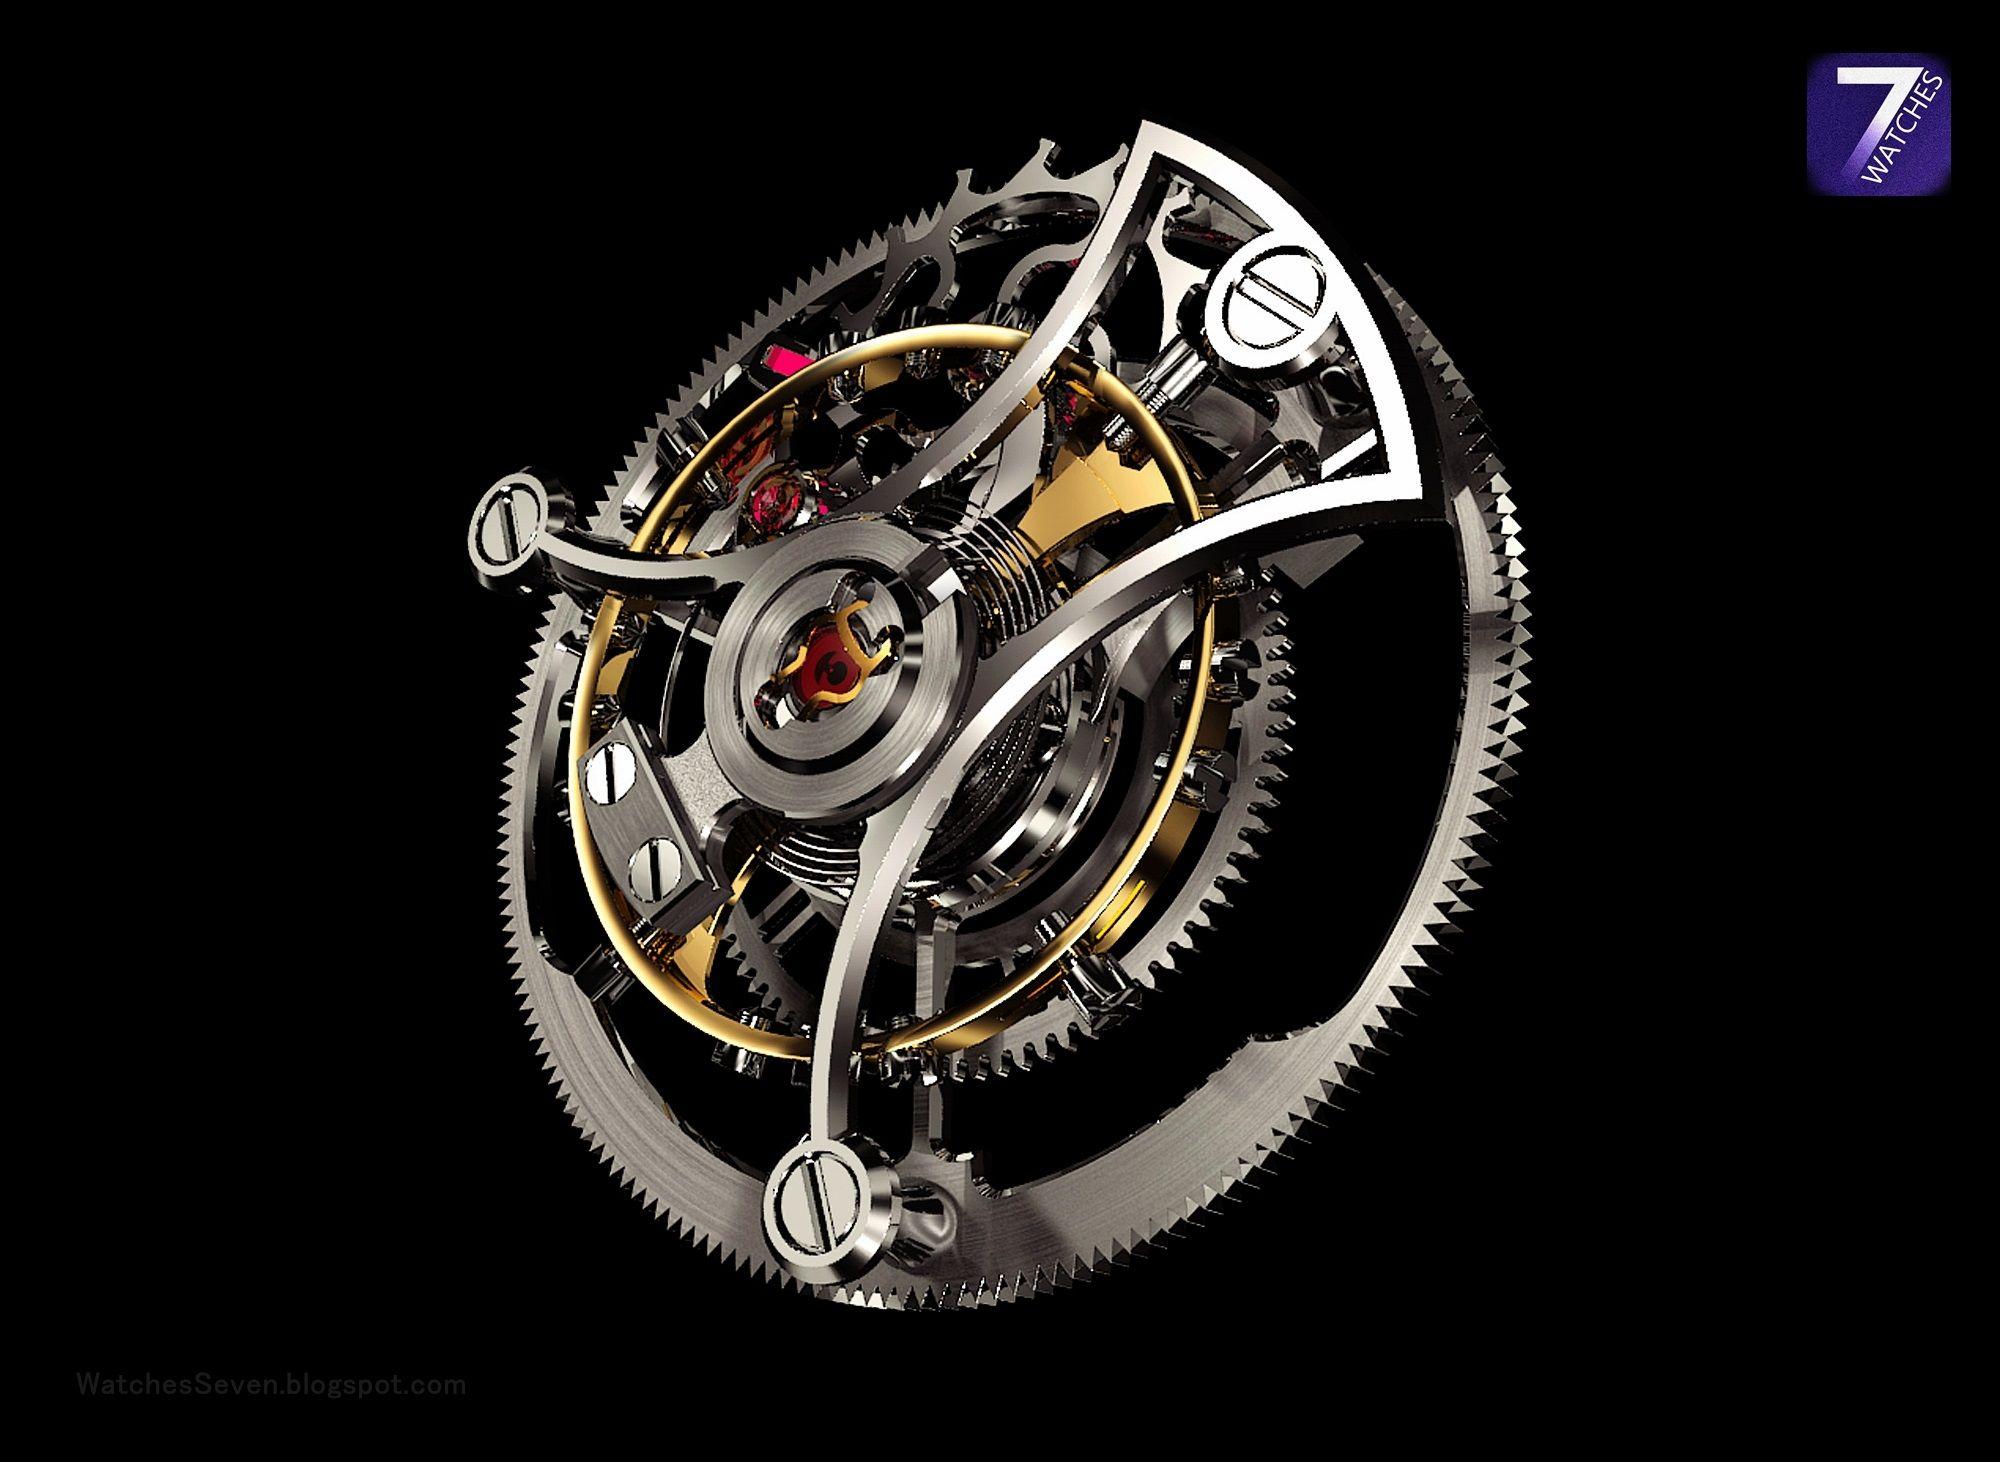 AkriviA - Tourbillon Monopusher Chronograph  (Caliber AA-01)